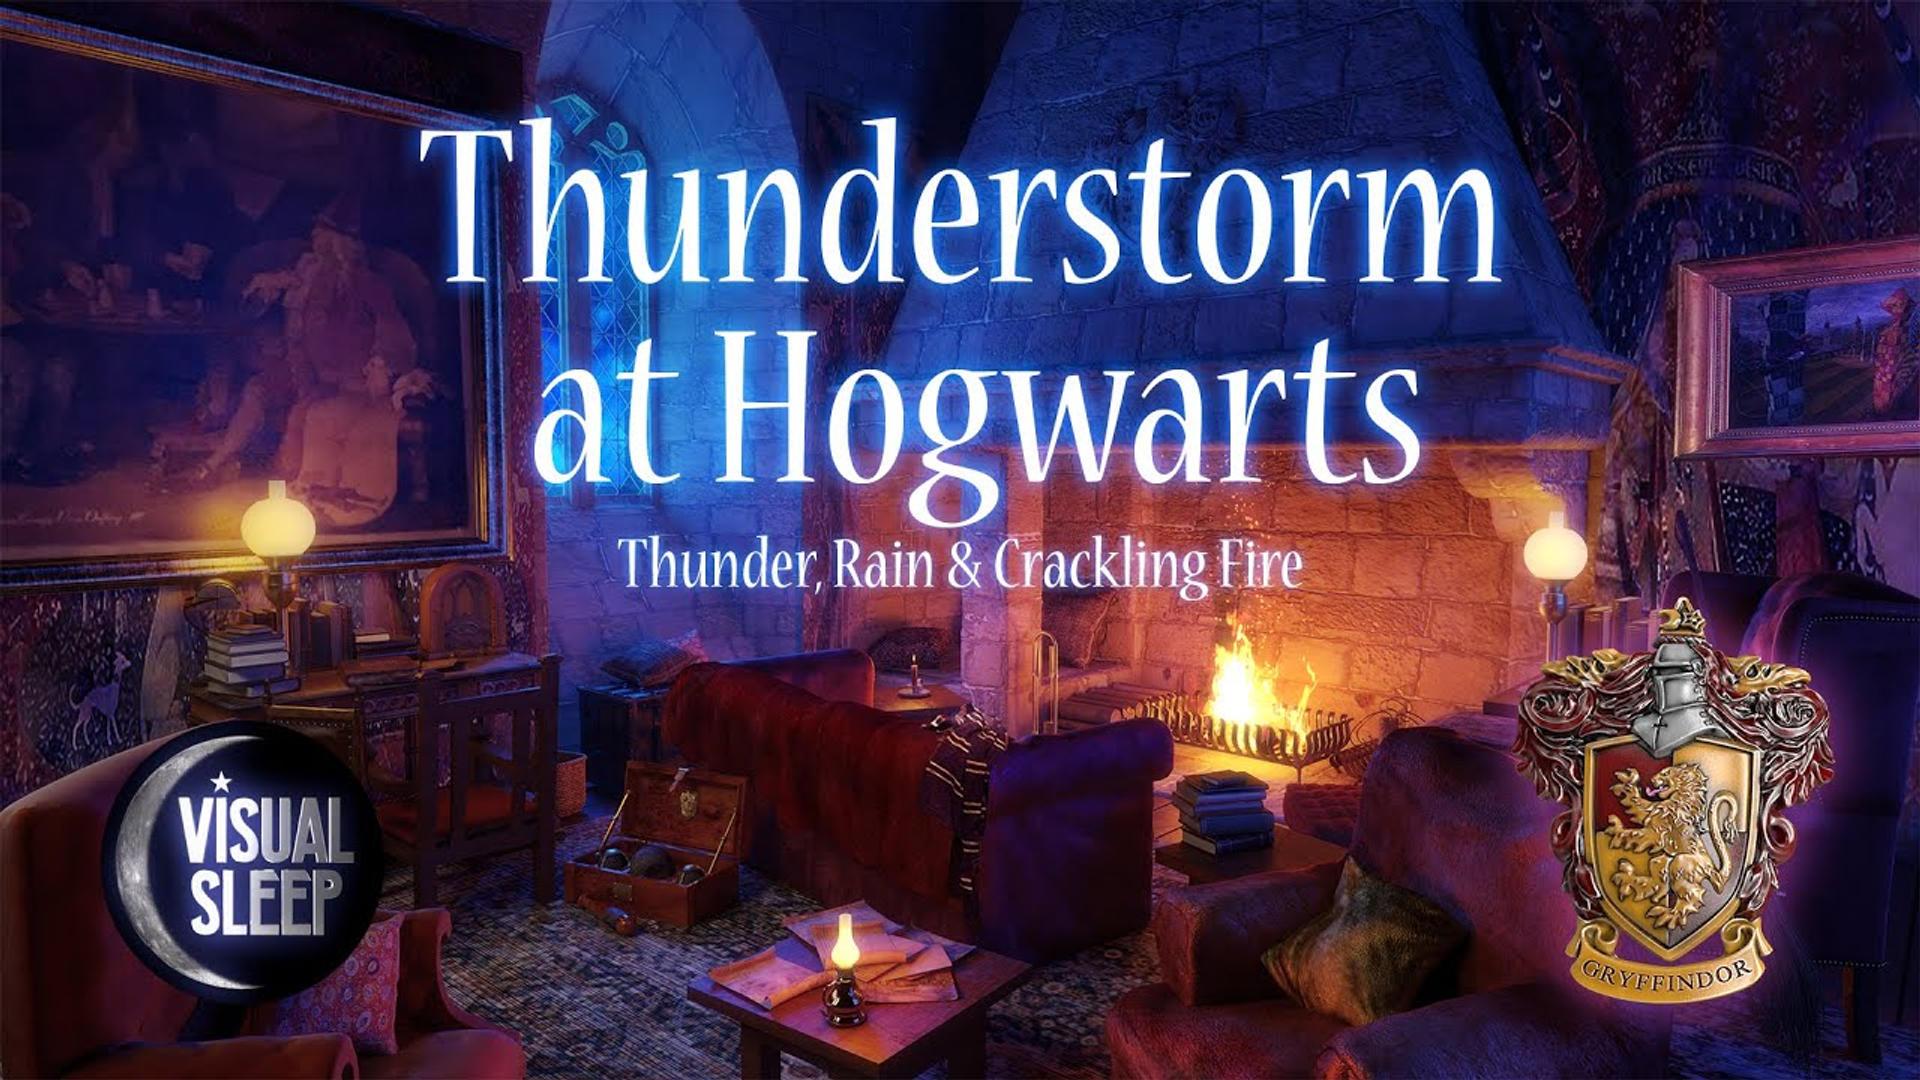 Thuderstorm at Hogwarts